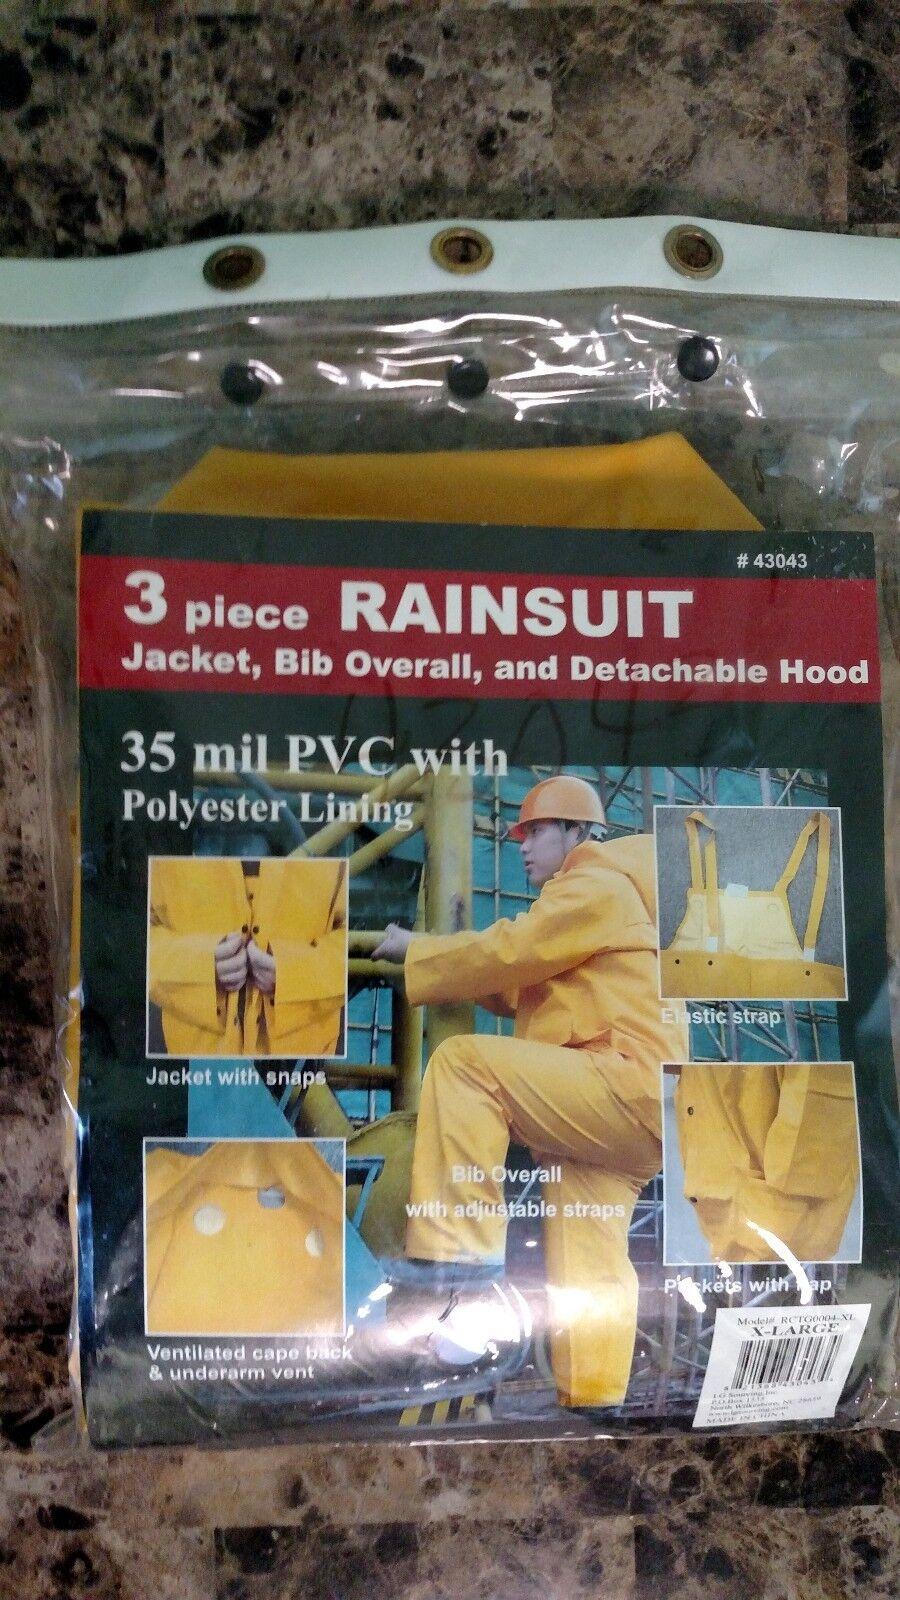 NEW 3 PIECE RAINSUIT Jacket, Bib Overall Hood 35 Mil PVC, Polyester Lining-XL - $7.00